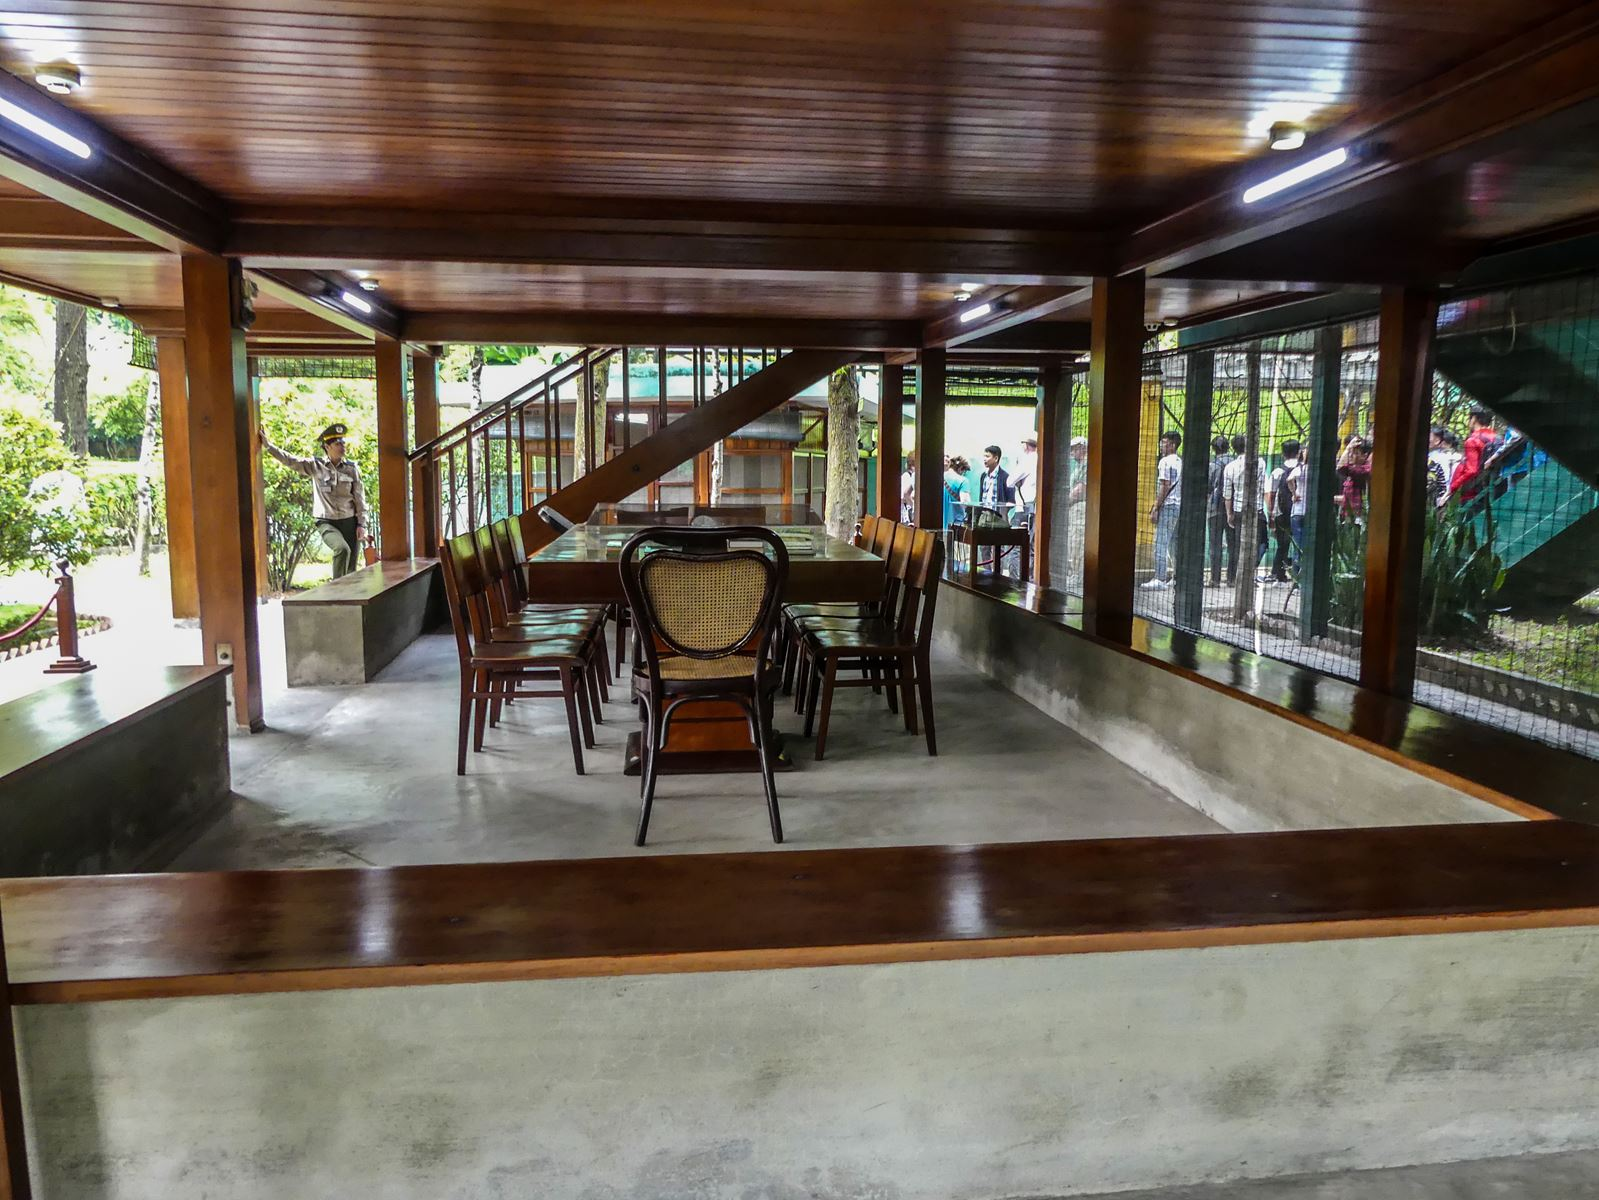 Claironyva Vietnam Hanoi Jardins et Maison su Pilotis Ho Chi Minh